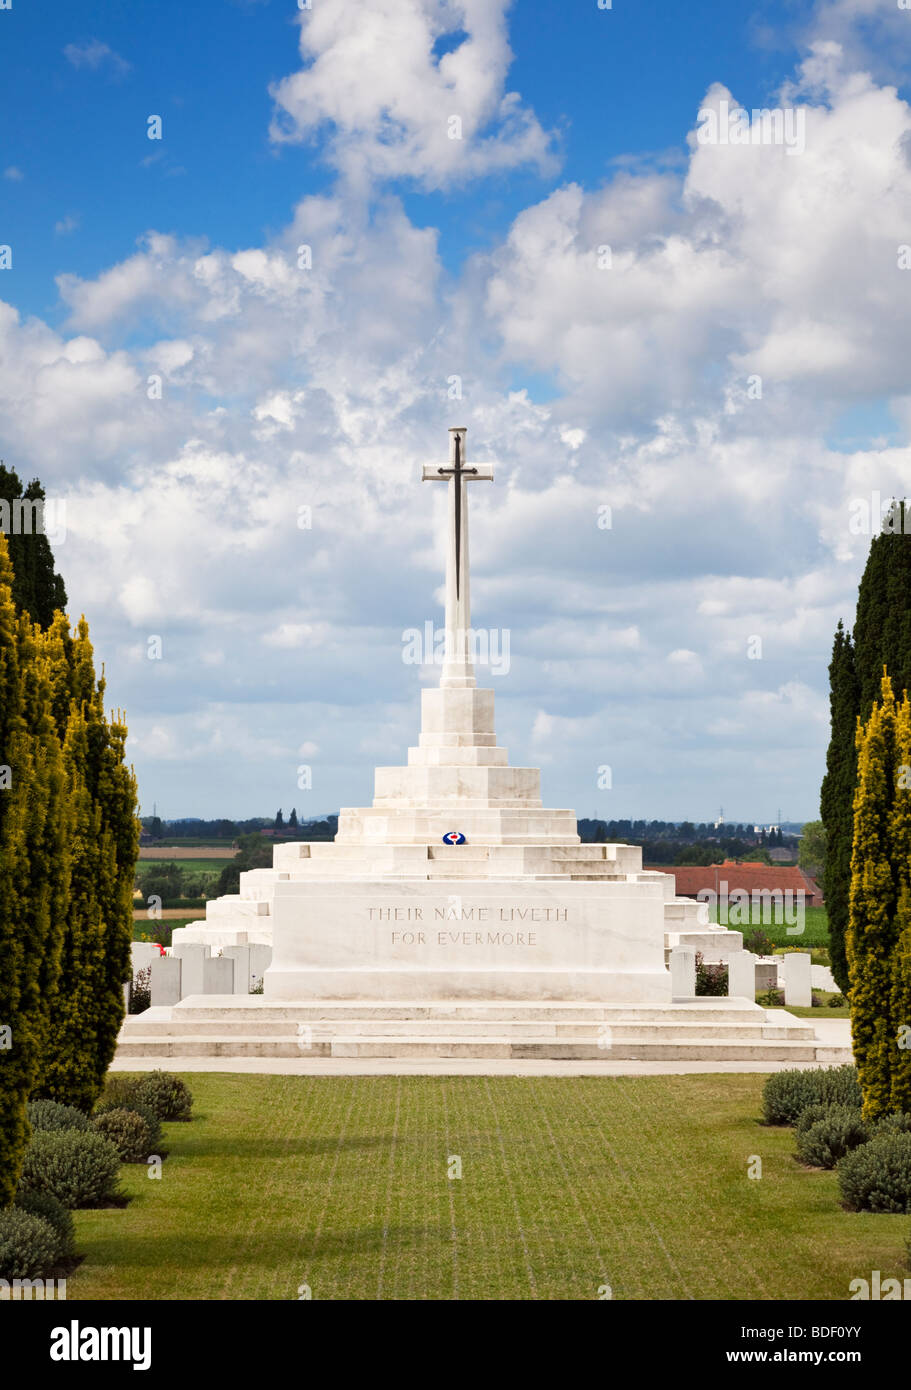 Cross of Sacrifice at Tyne Cot Cemetery, WW1 Commonwealth military cemetery Passchendaele, Flanders, Belgium, Europe - Stock Image